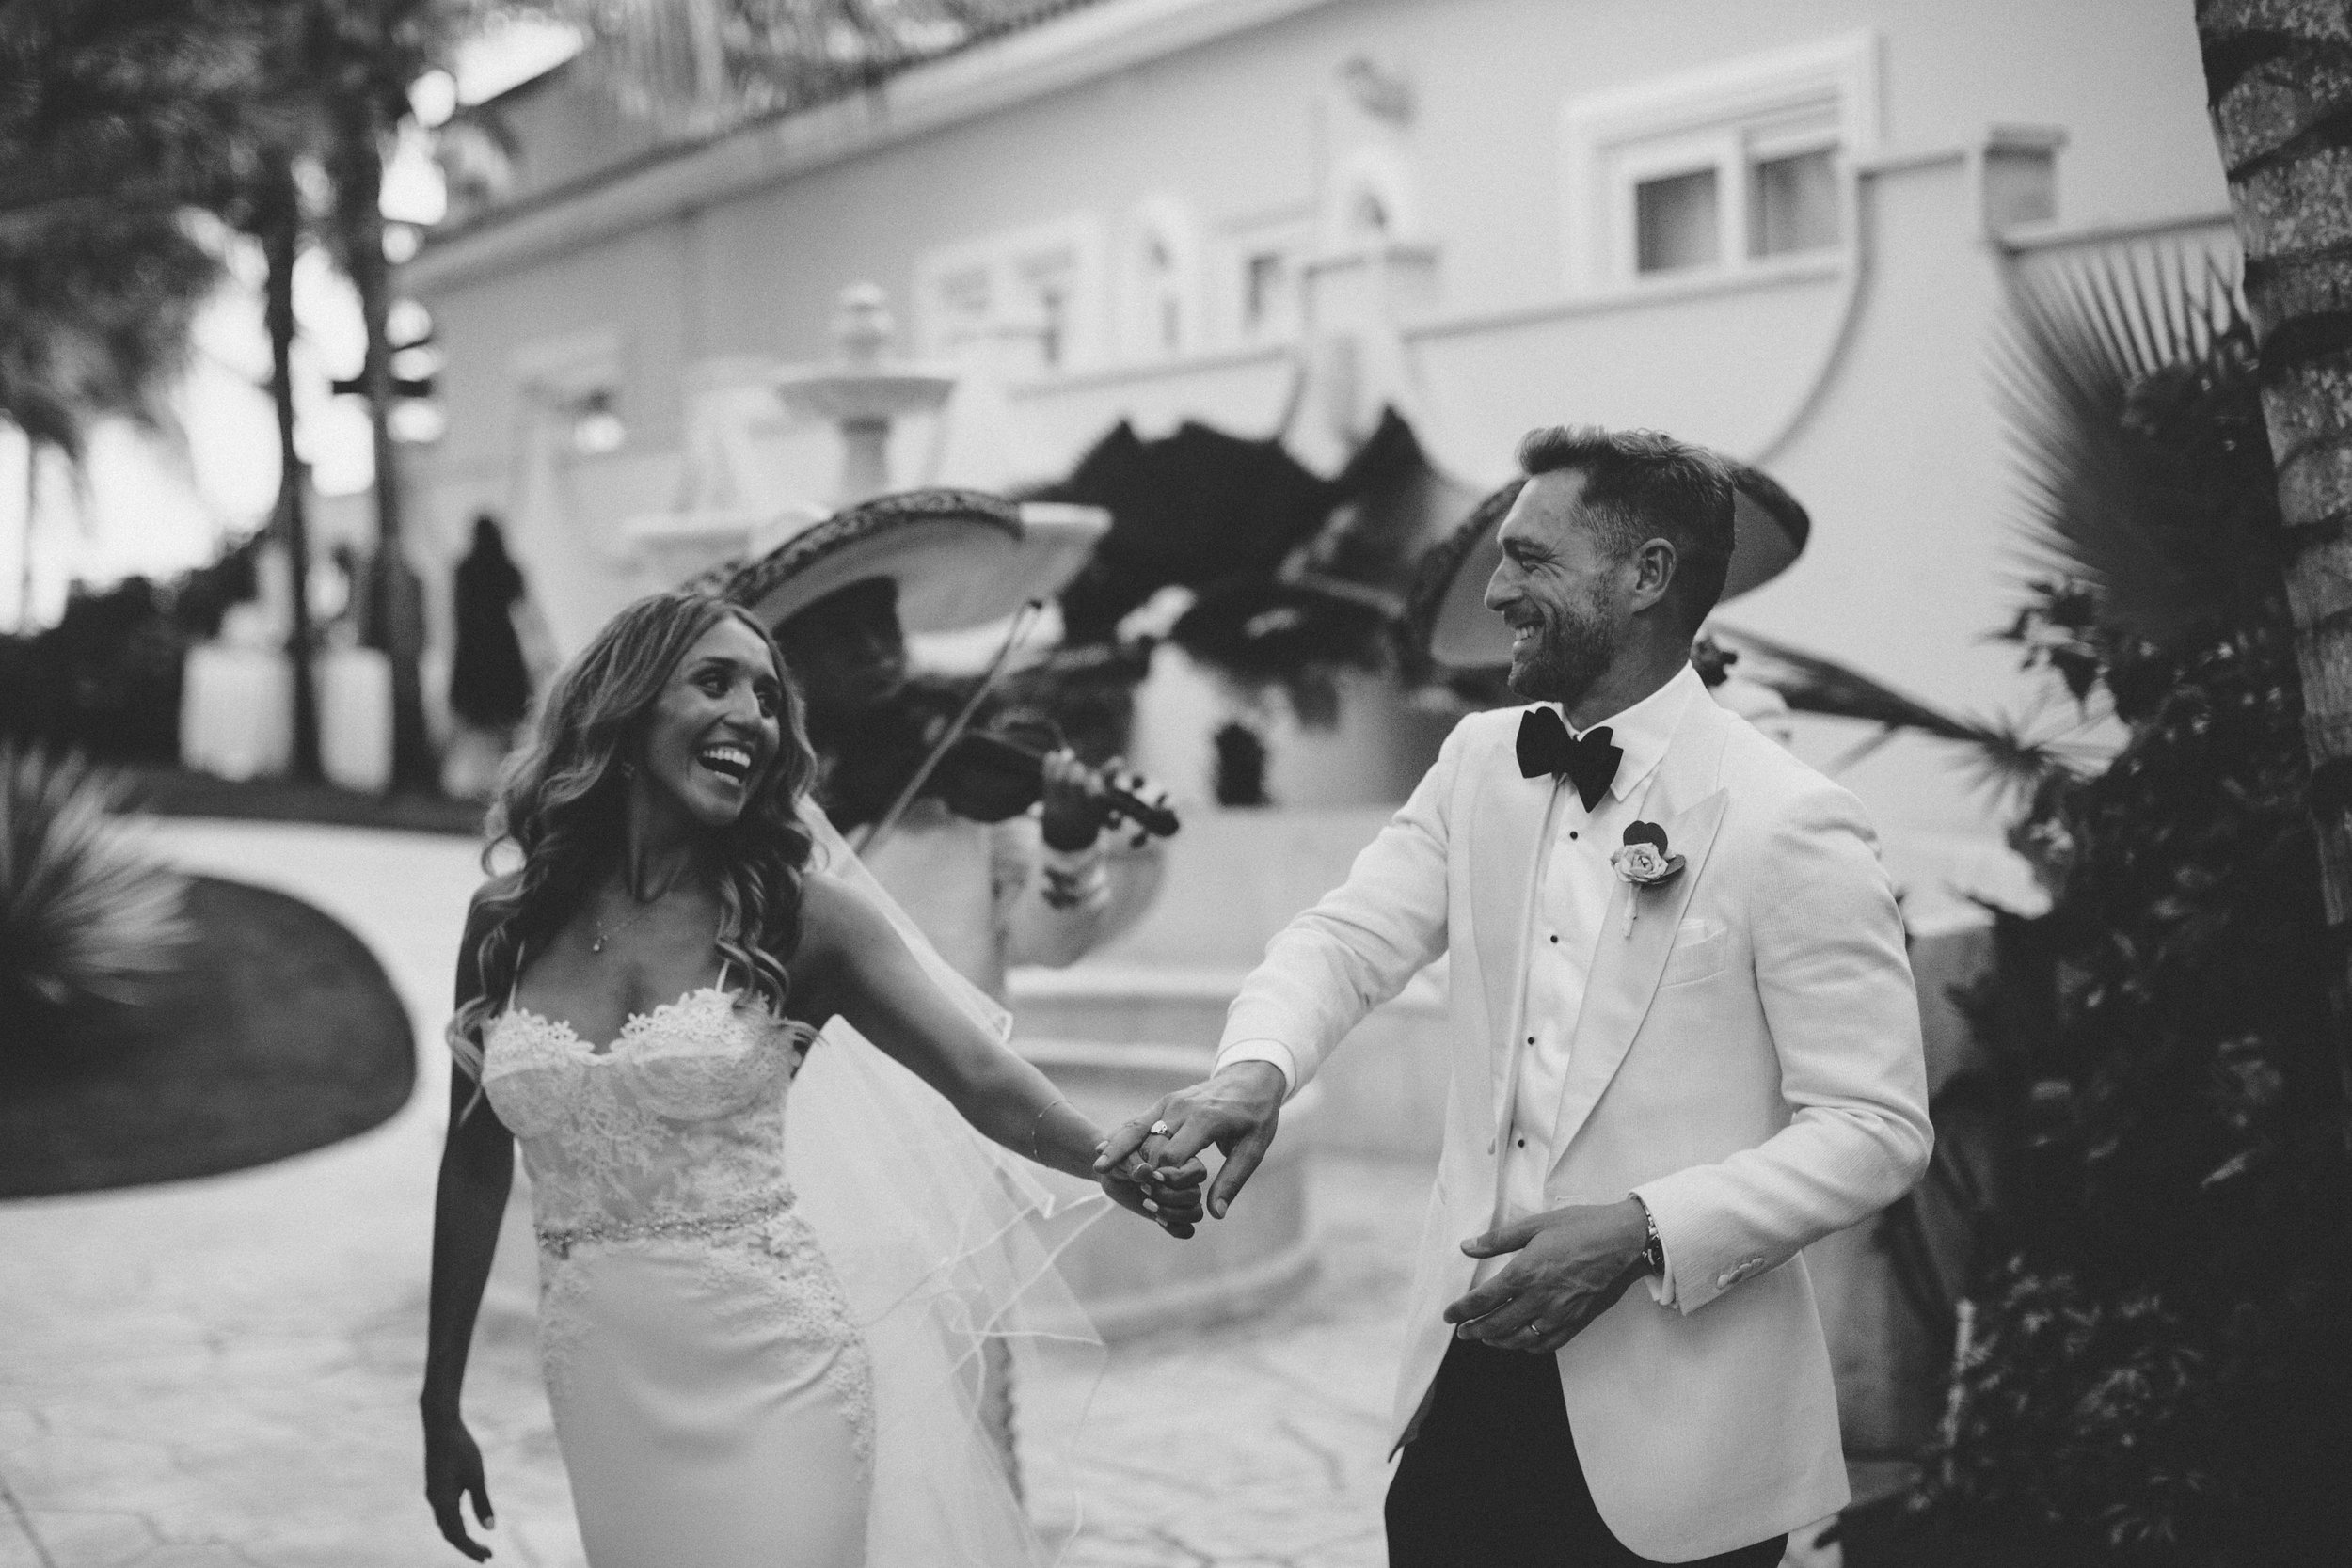 mexico_wedding_cancun_villa_la_joya_evangeline_lane_108.jpg